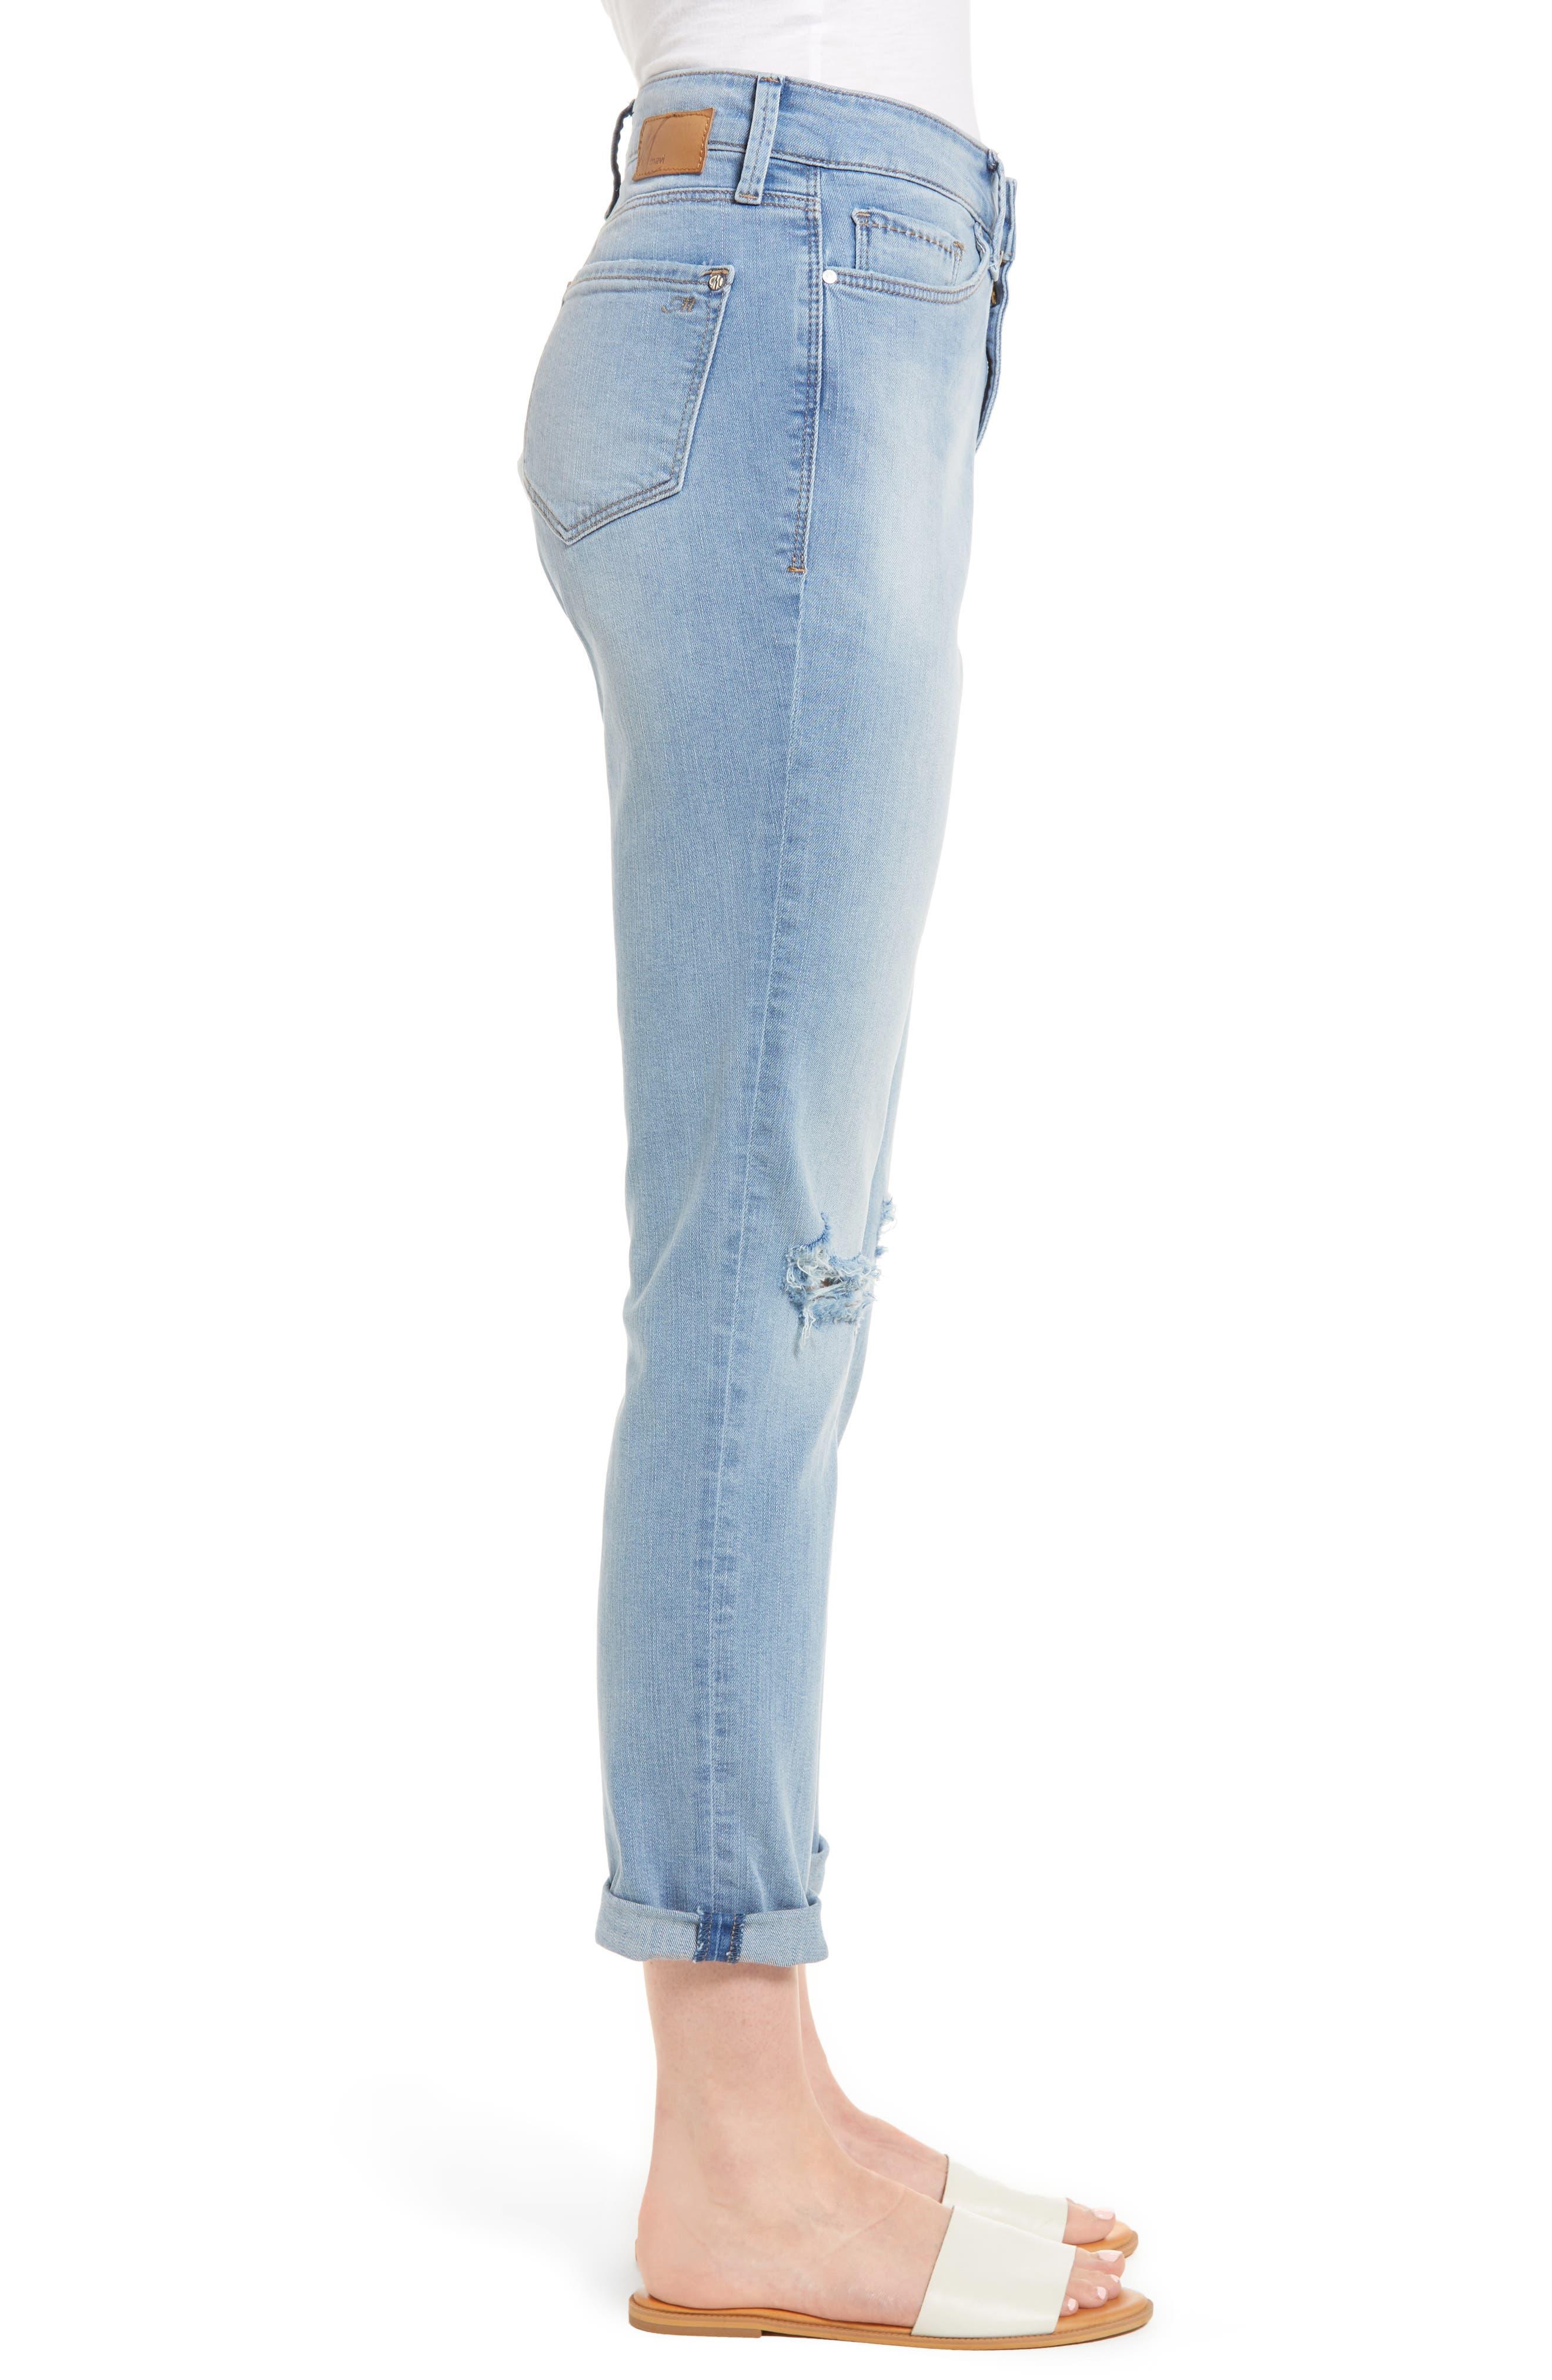 Lea Boyfriend Ripped Jeans,                             Alternate thumbnail 3, color,                             Light Ripped Vintage